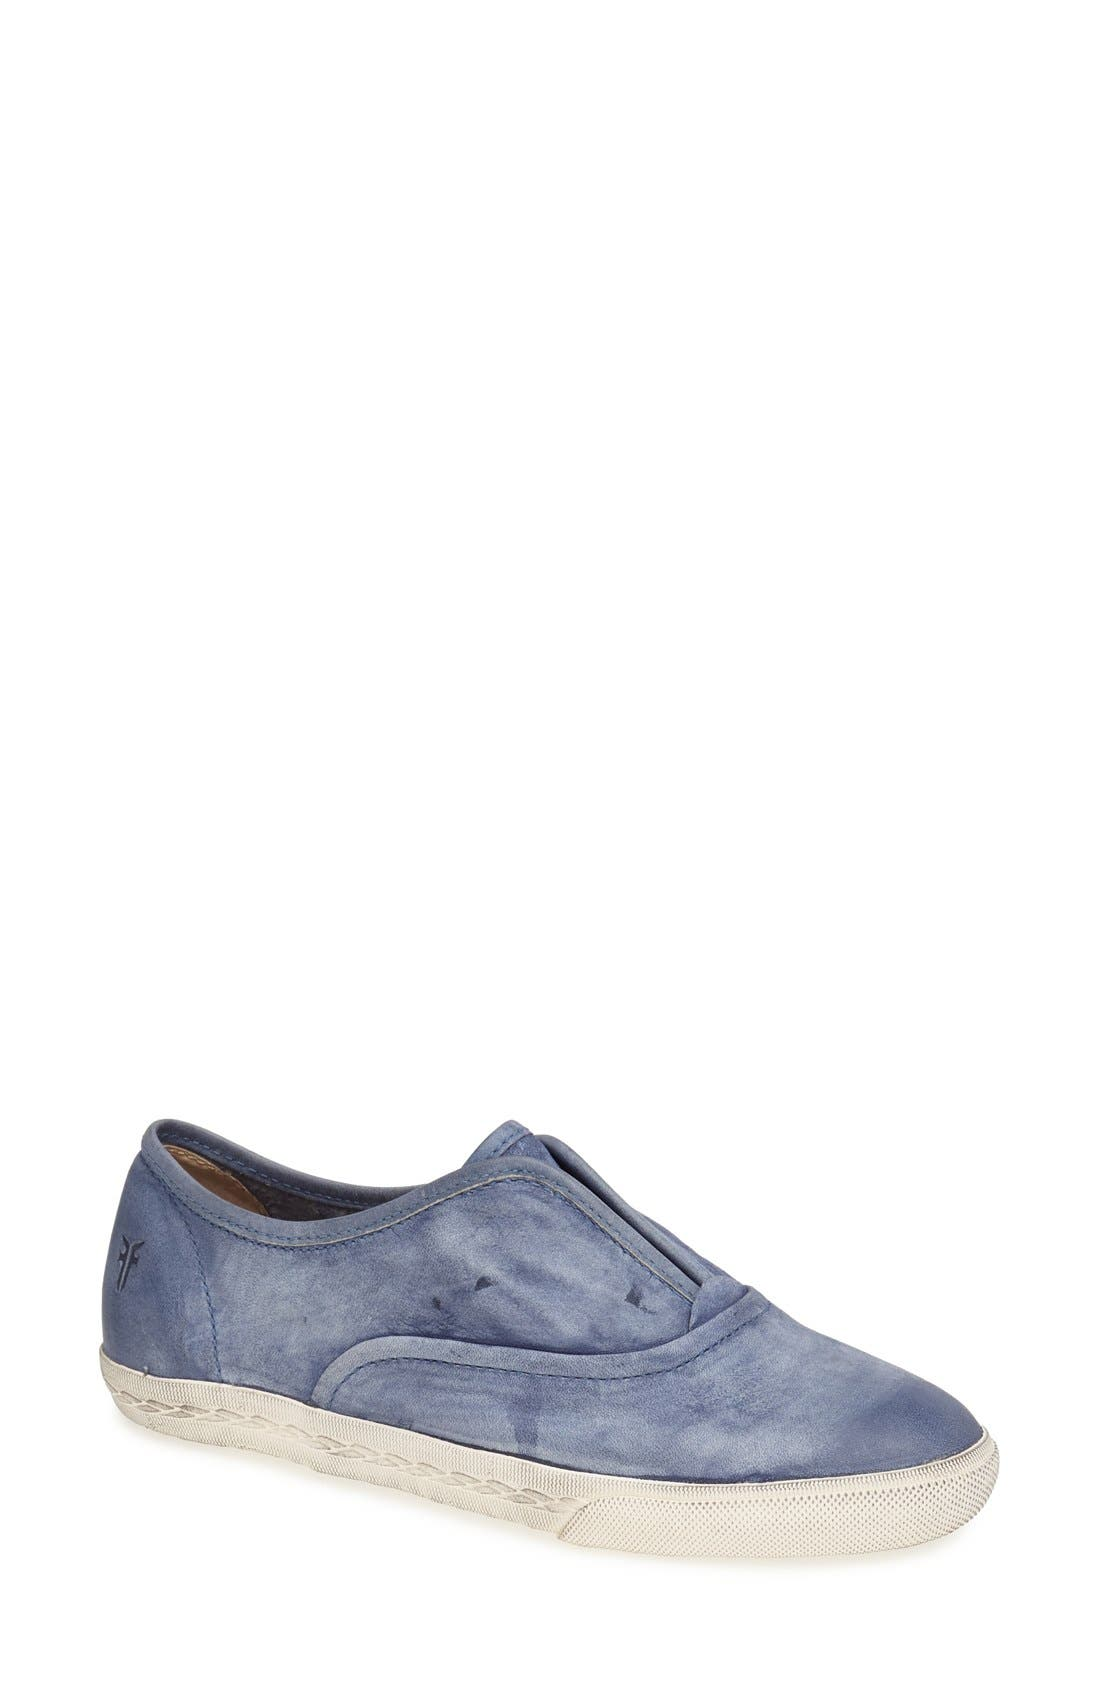 Alternate Image 1 Selected - Frye 'Mindy' Slip-On Leather Sneaker (Women)